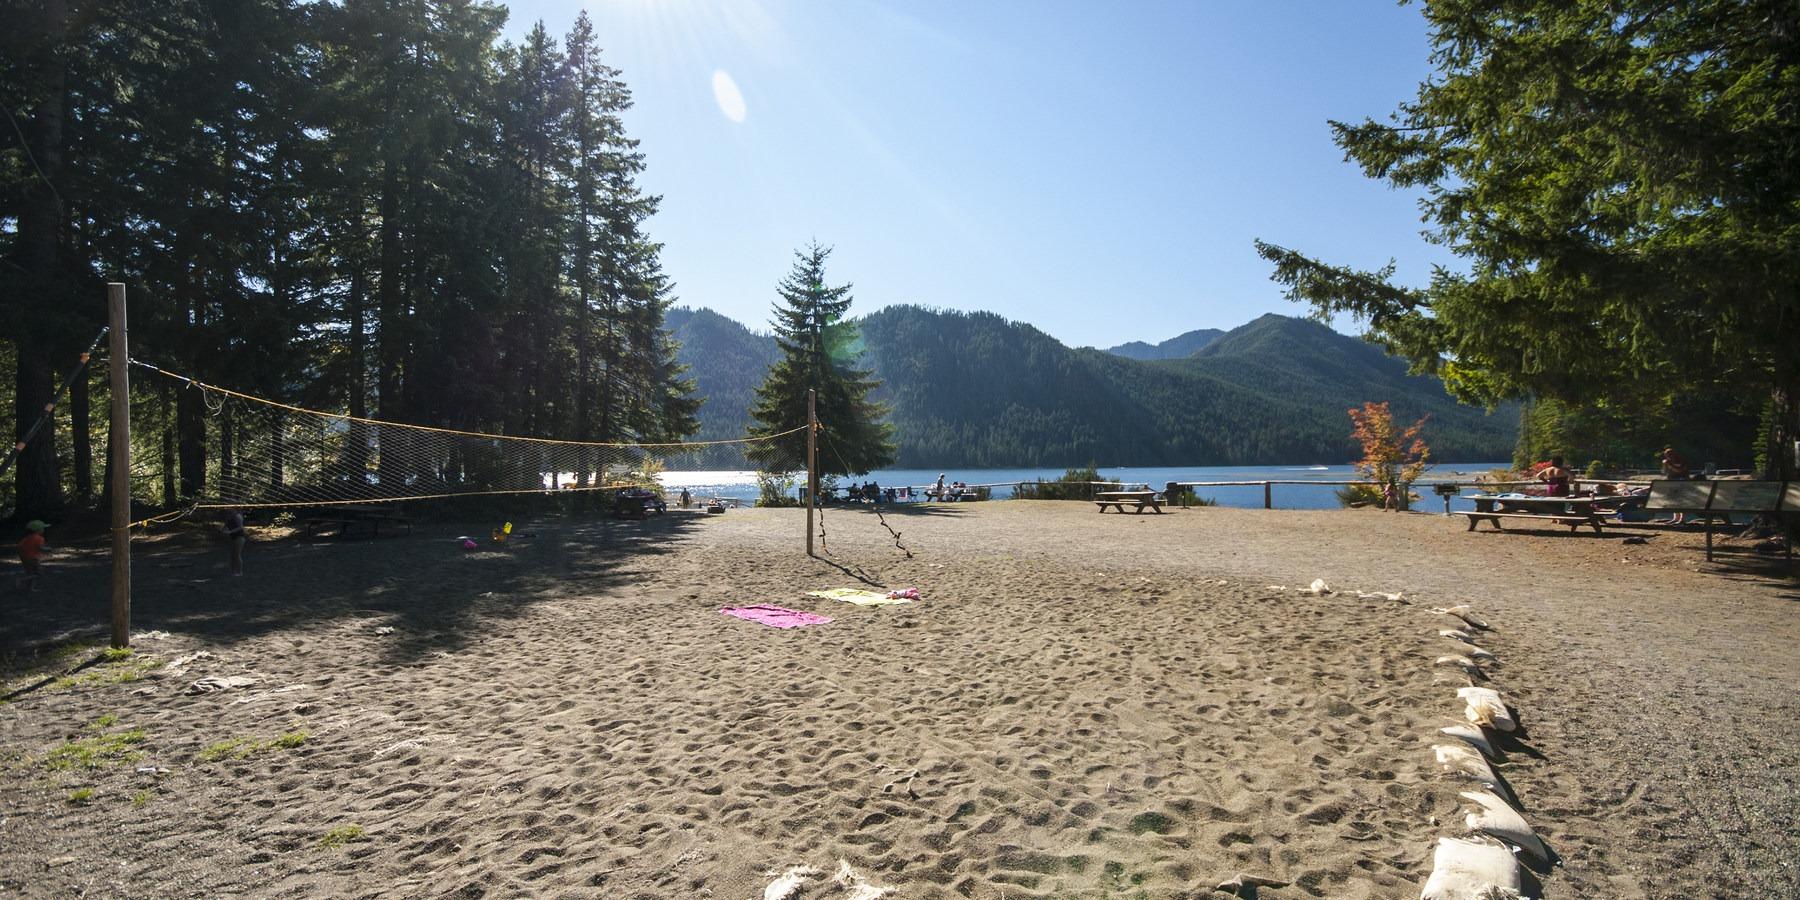 lake cushman skokomish park beach day use area outdoor project